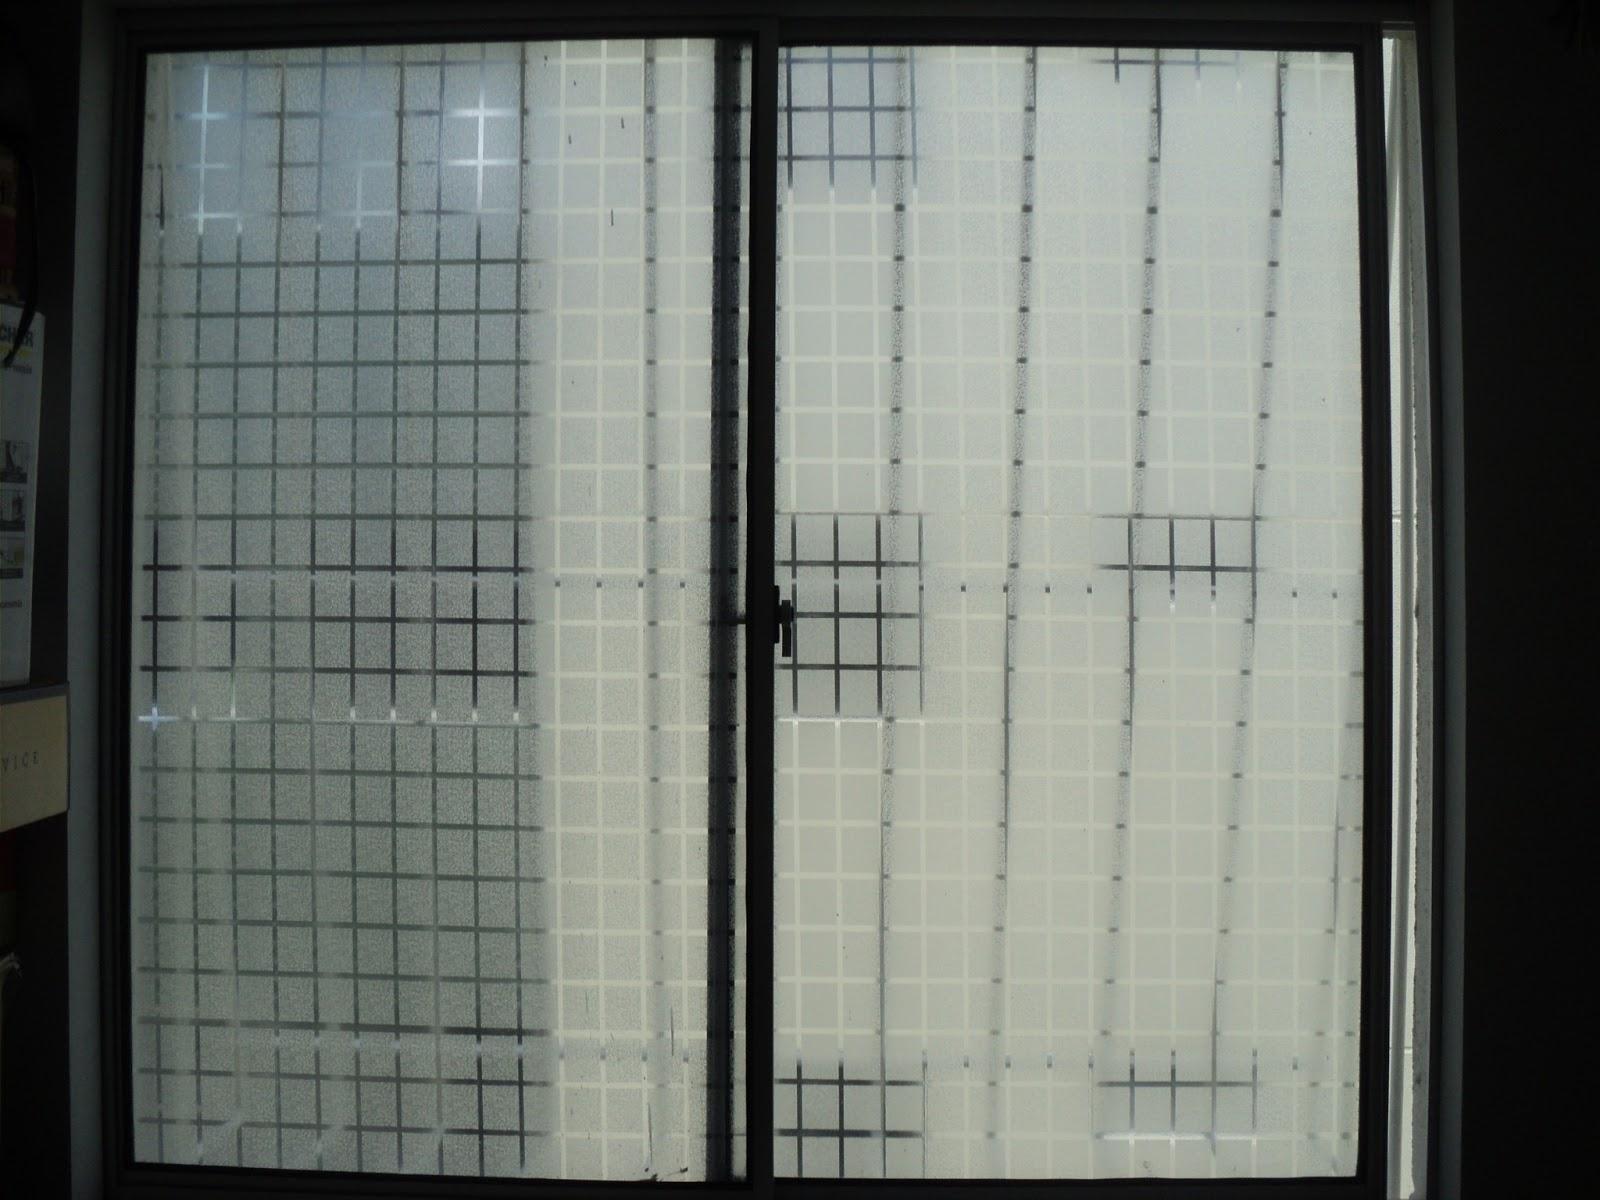 #5B6970 Adesivo jateado quadriculado em Recife Camaragibe Olinda Paulista  270 Janelas De Vidro Recife Pe